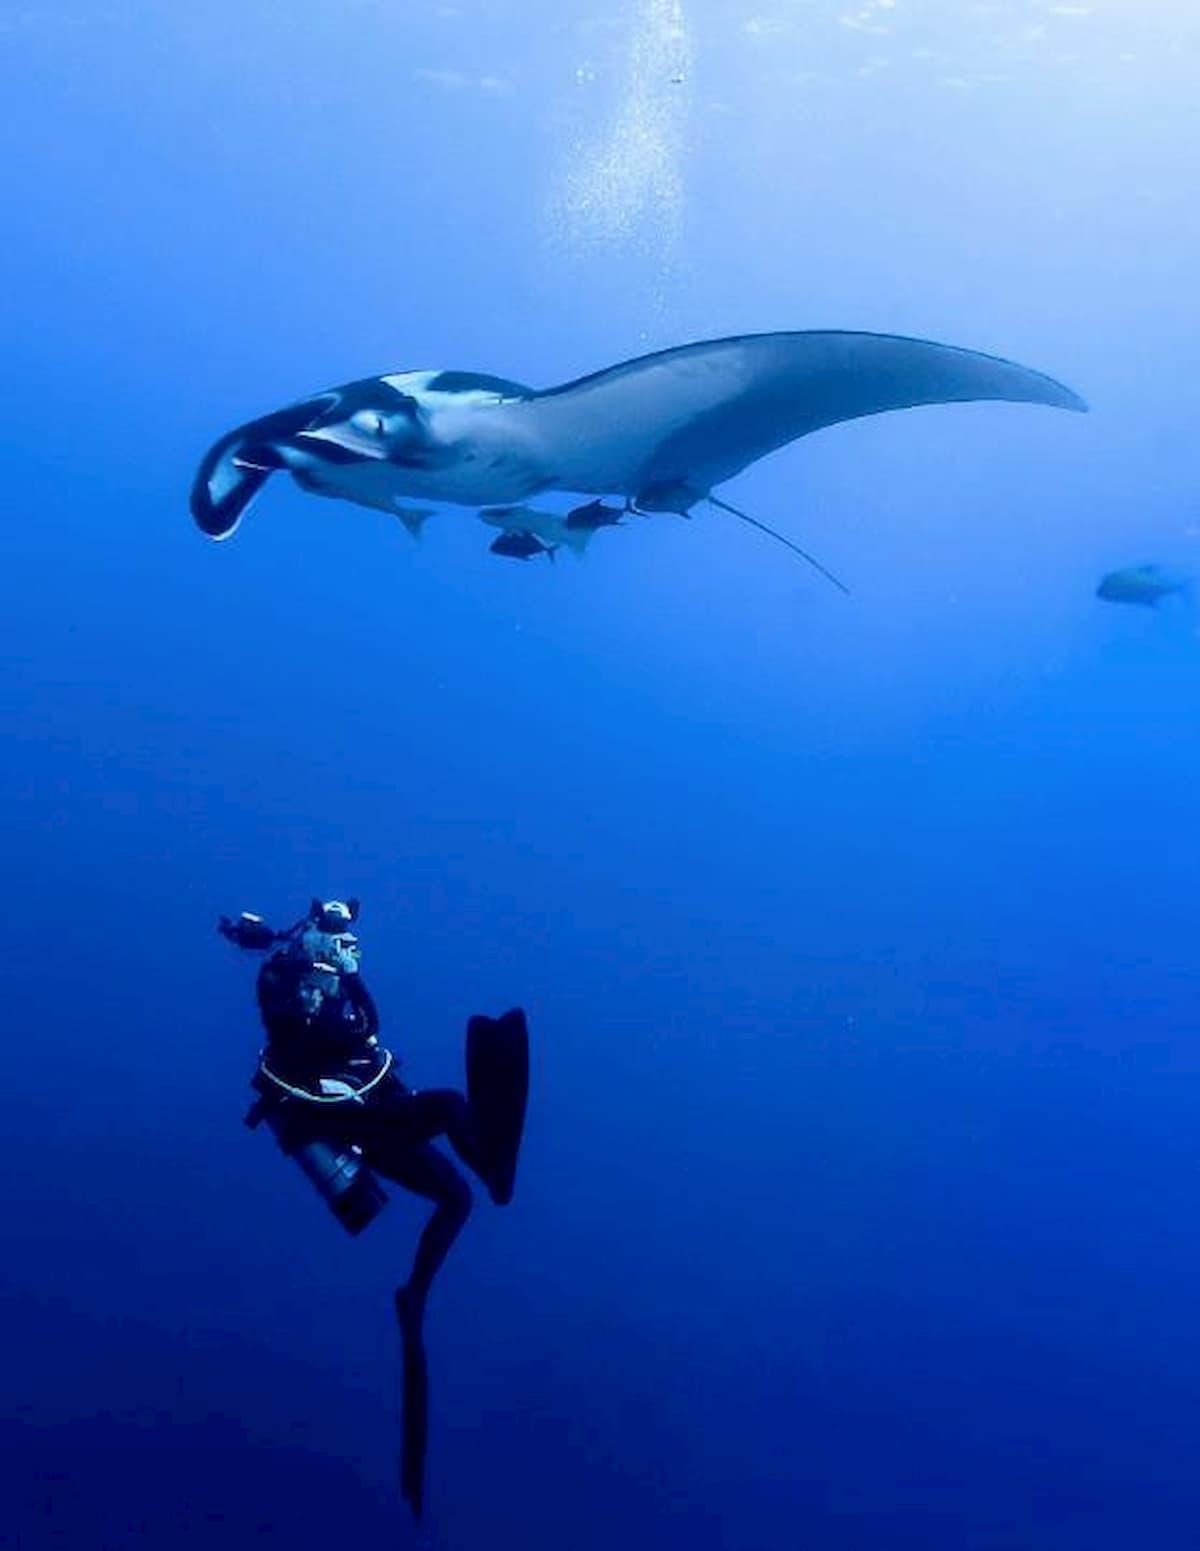 underwater Photographer Sylvie Ayerunderwater Photographer Sylvie Ayer